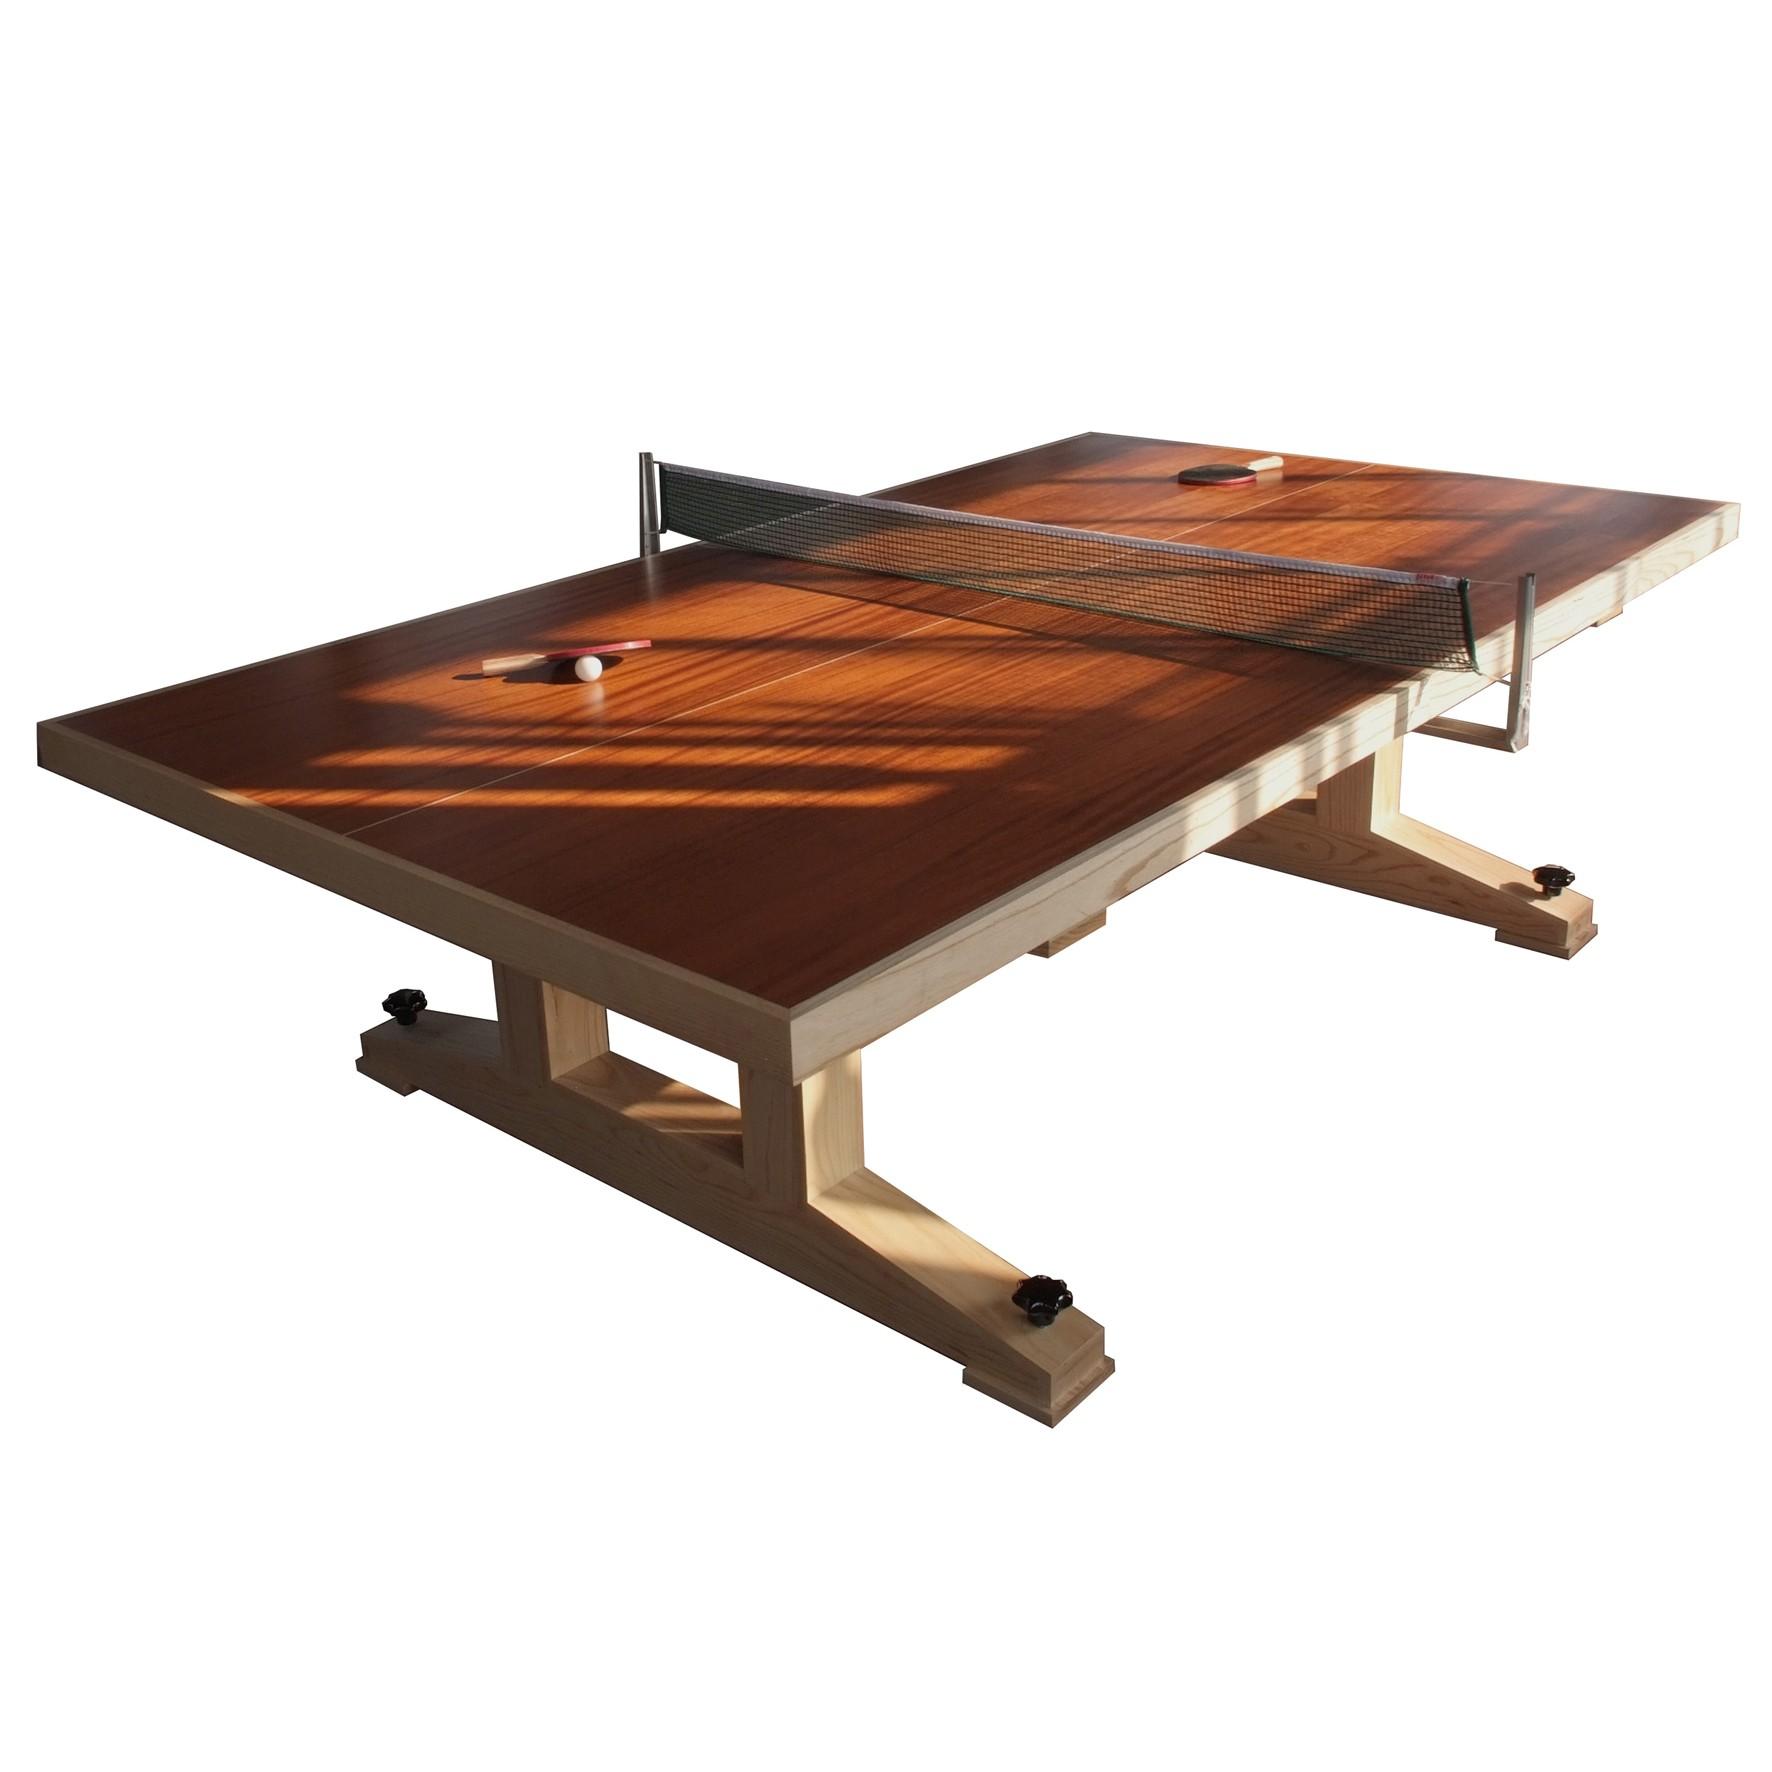 Designer Ping Pong Table 2